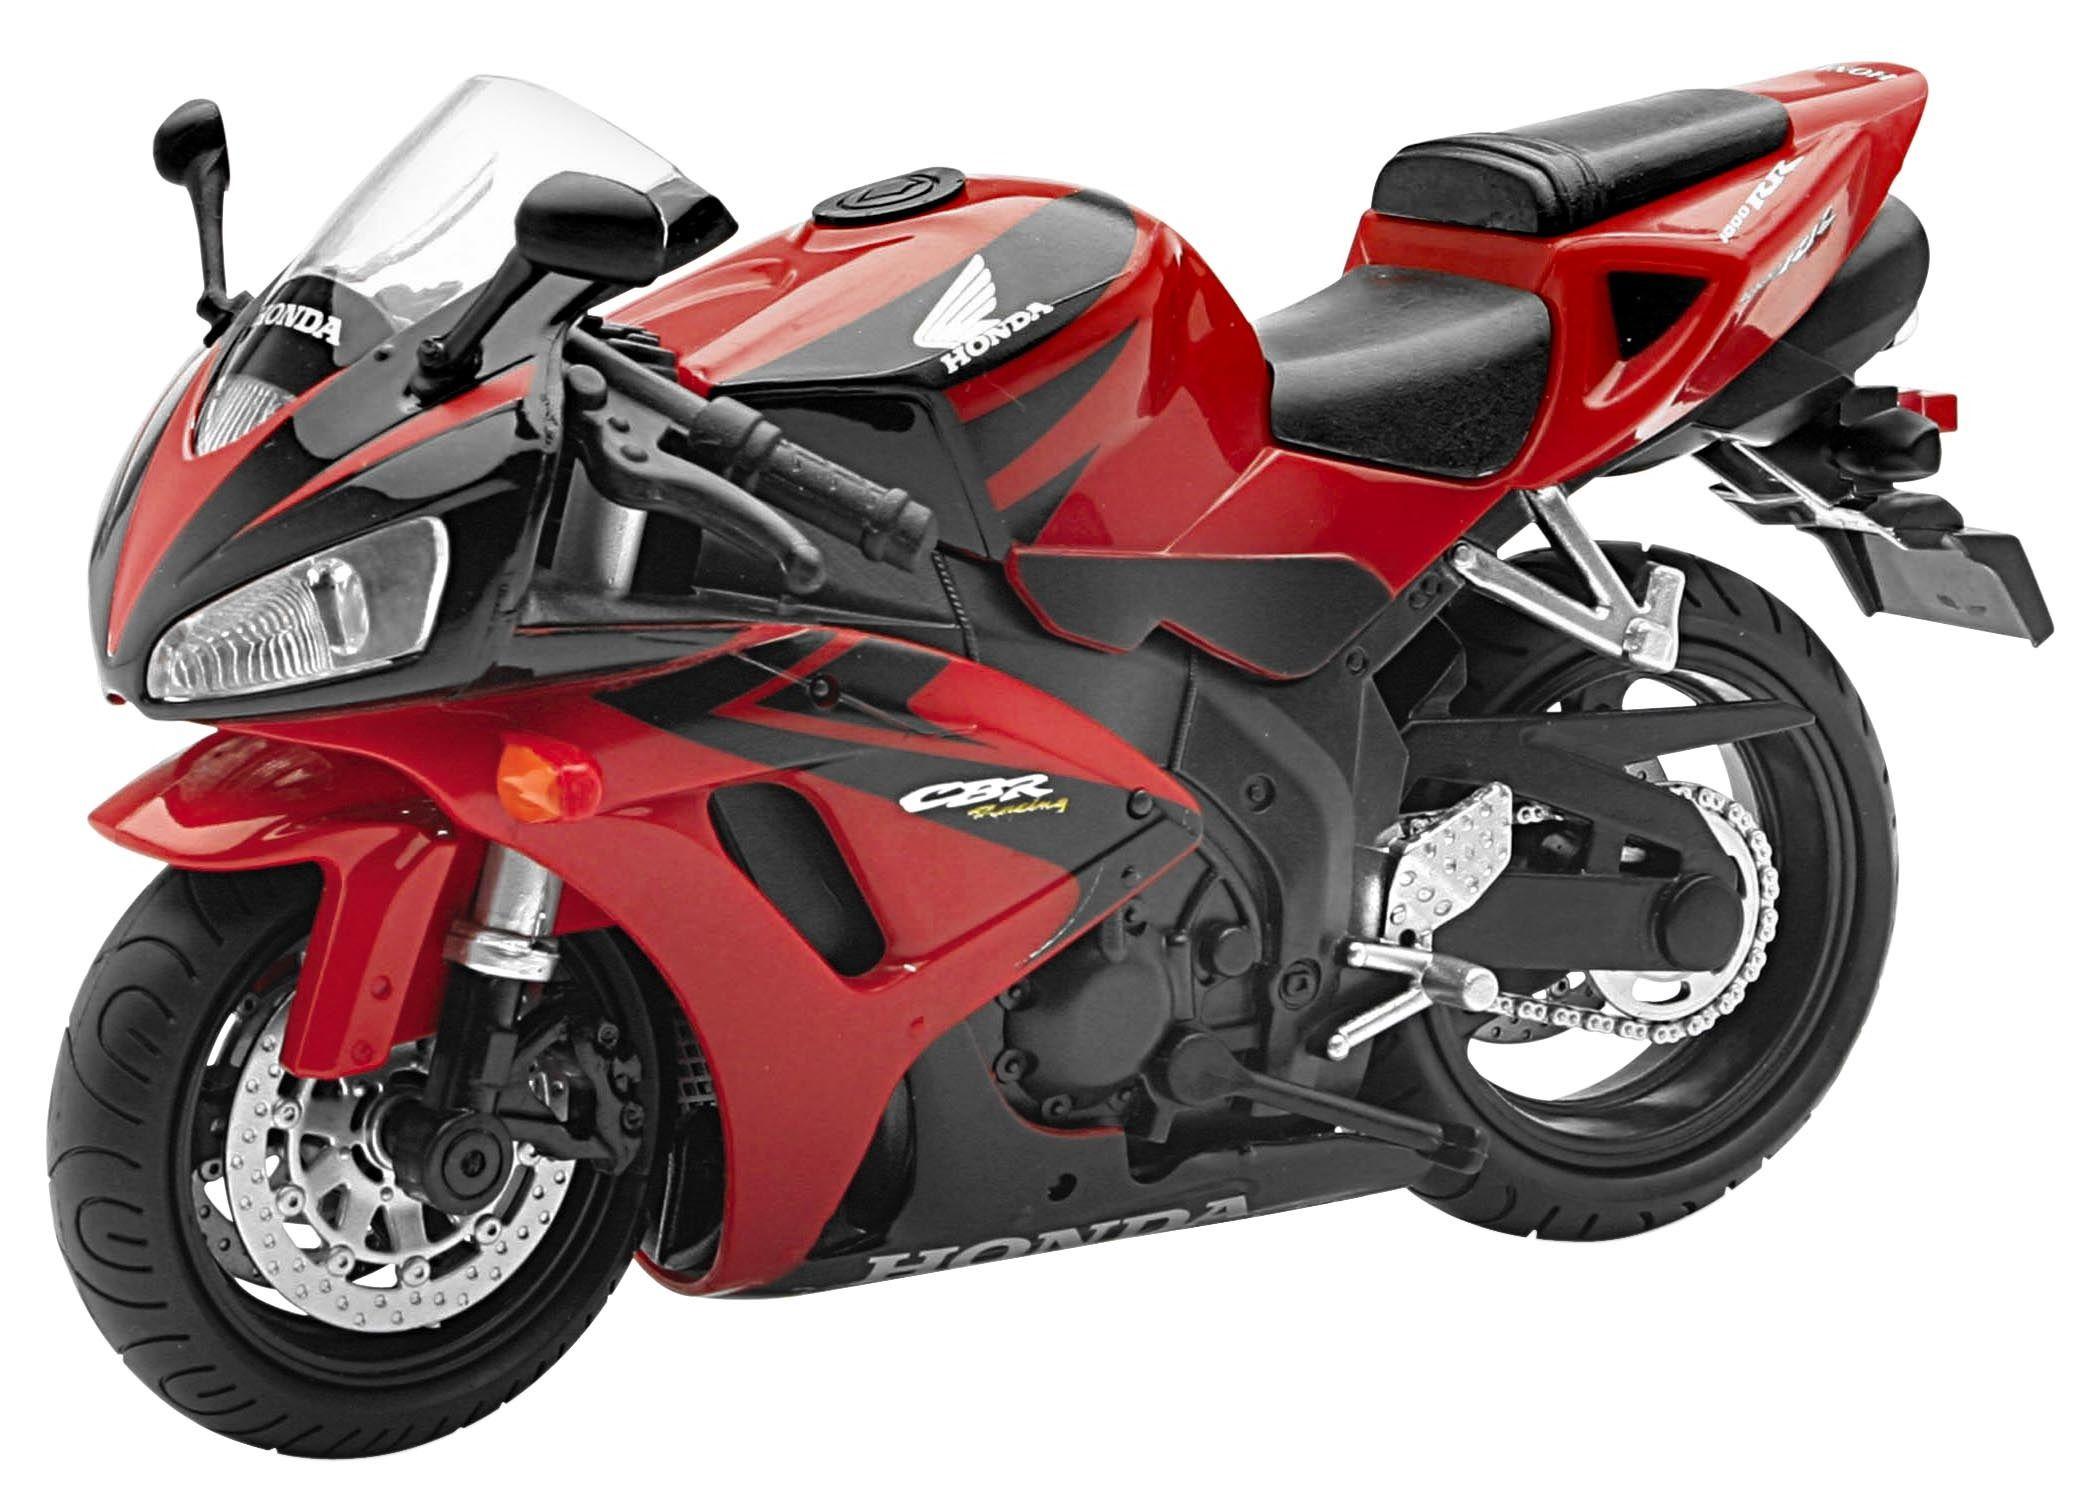 ray toy toys honda cbr1000rr scale cbr1000 lights revzilla motorcycle sound 2007 motorcycles sounds sp models bikes